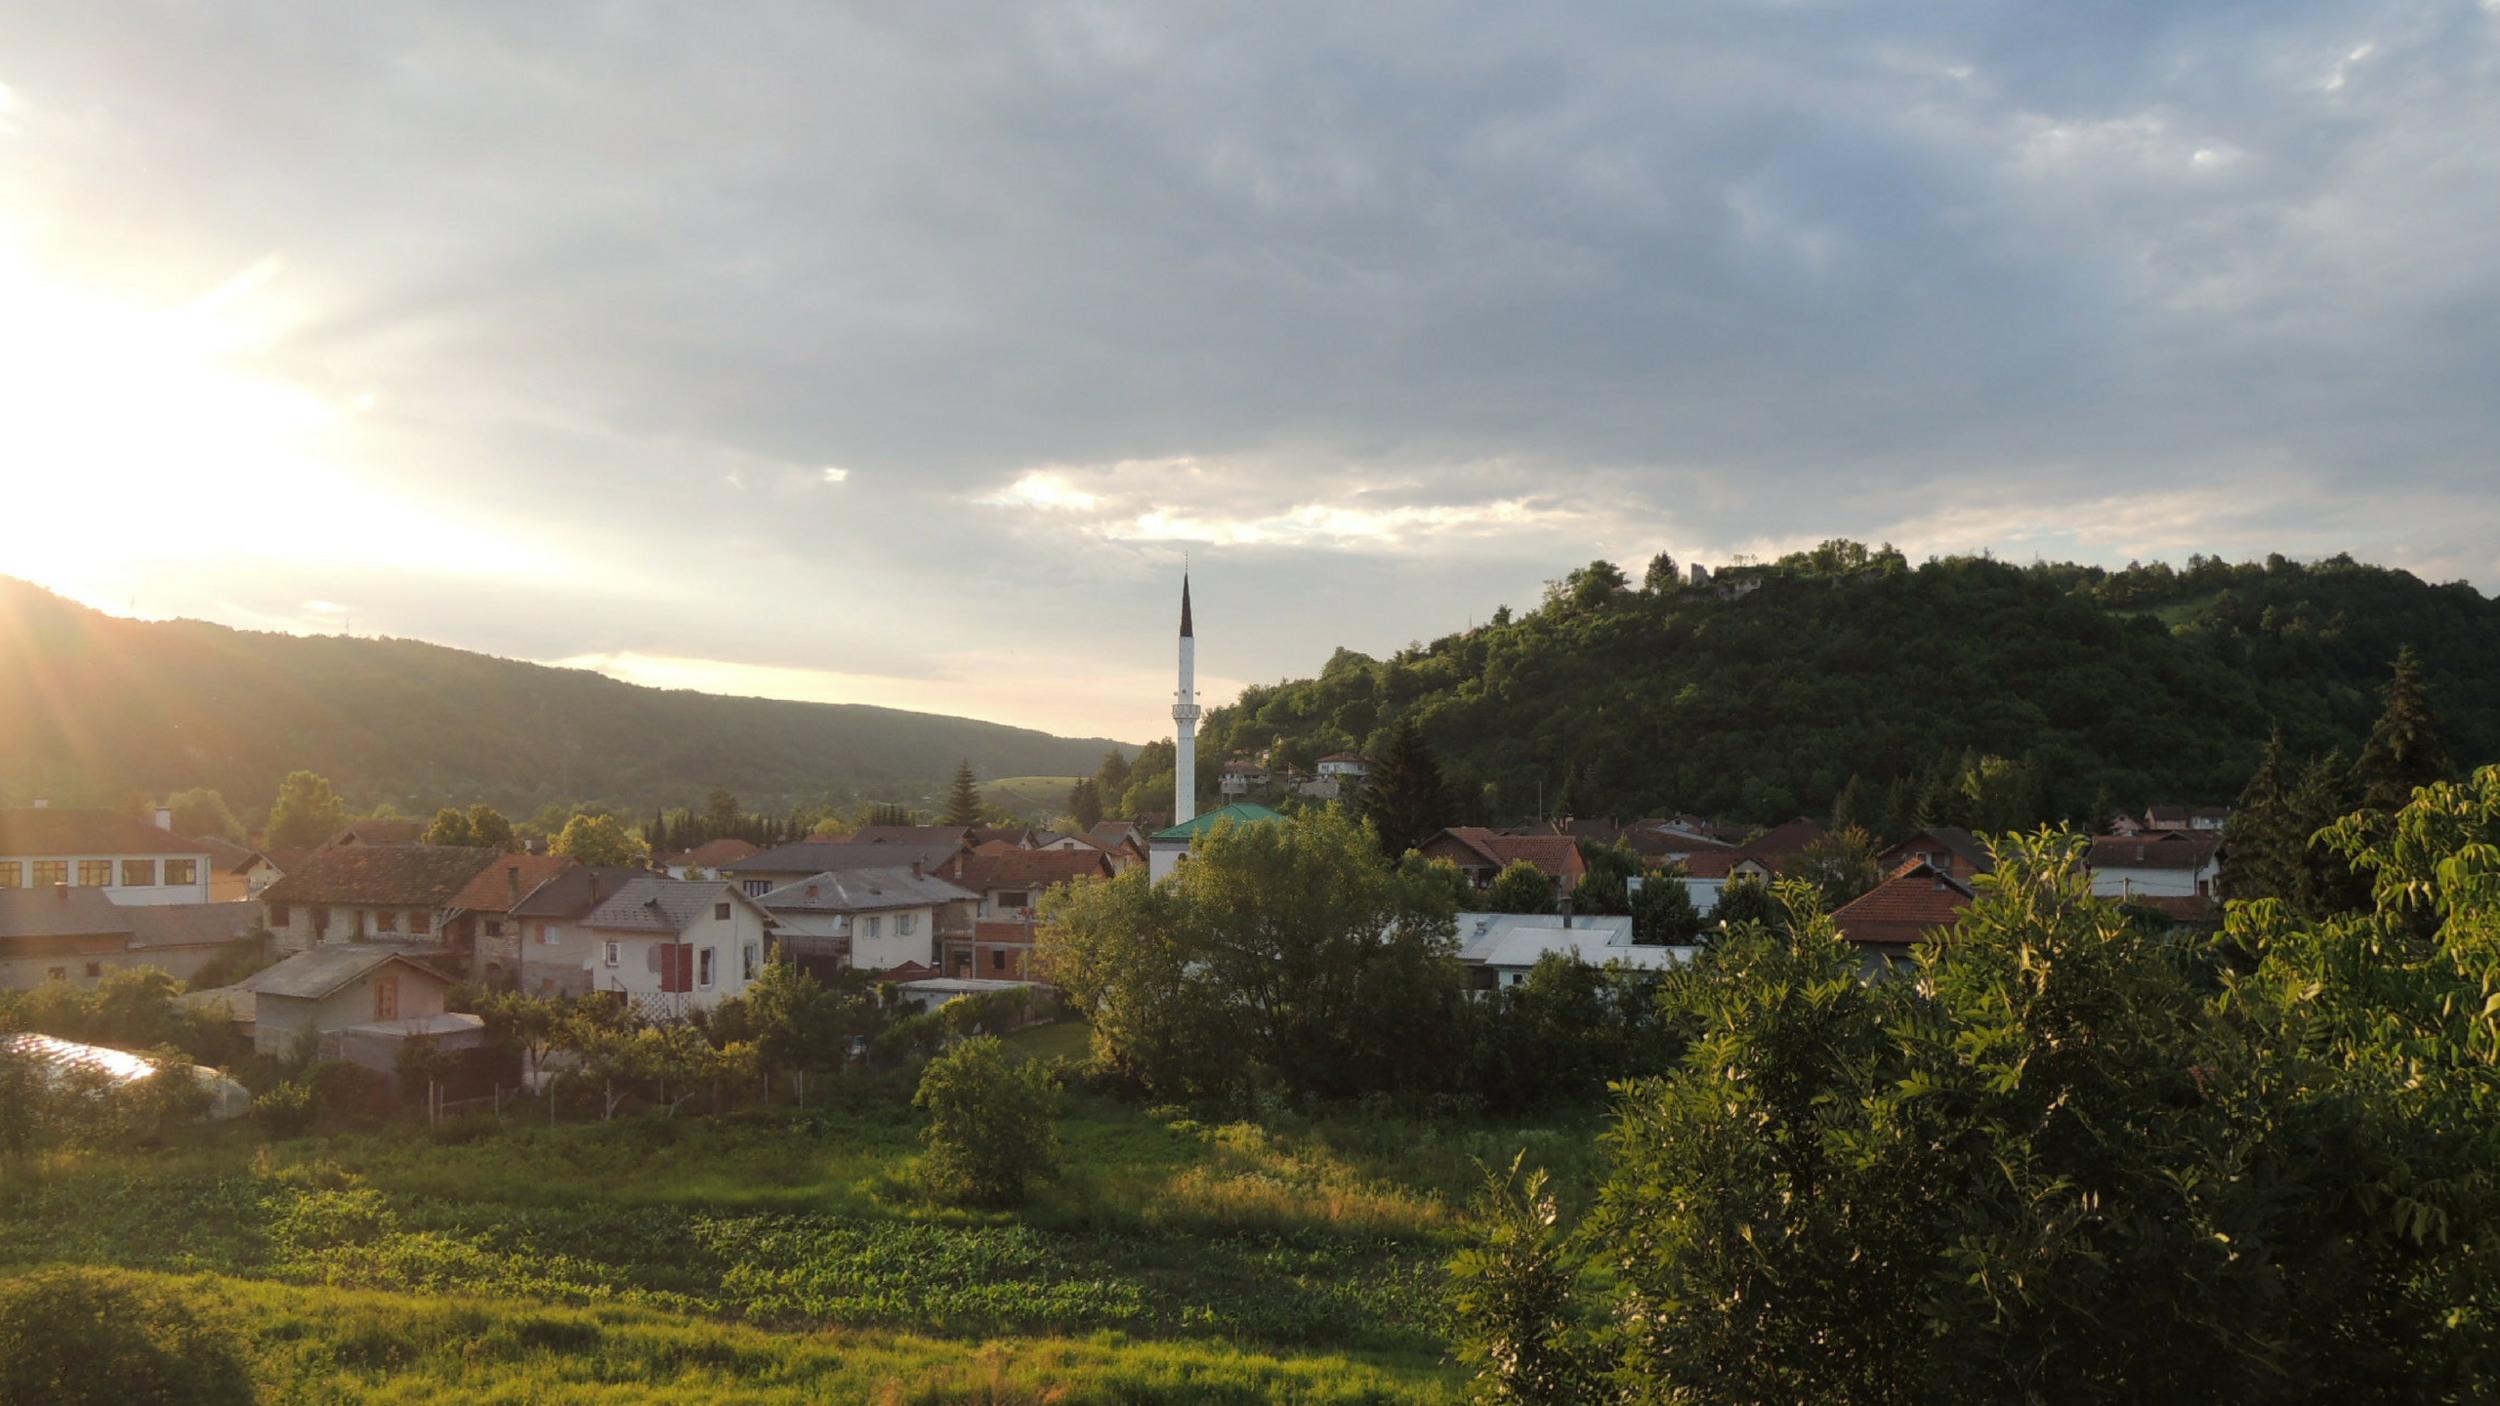 Kulen Vakuf, Bosnia-Herzegovina |Photo by Max Bergholz